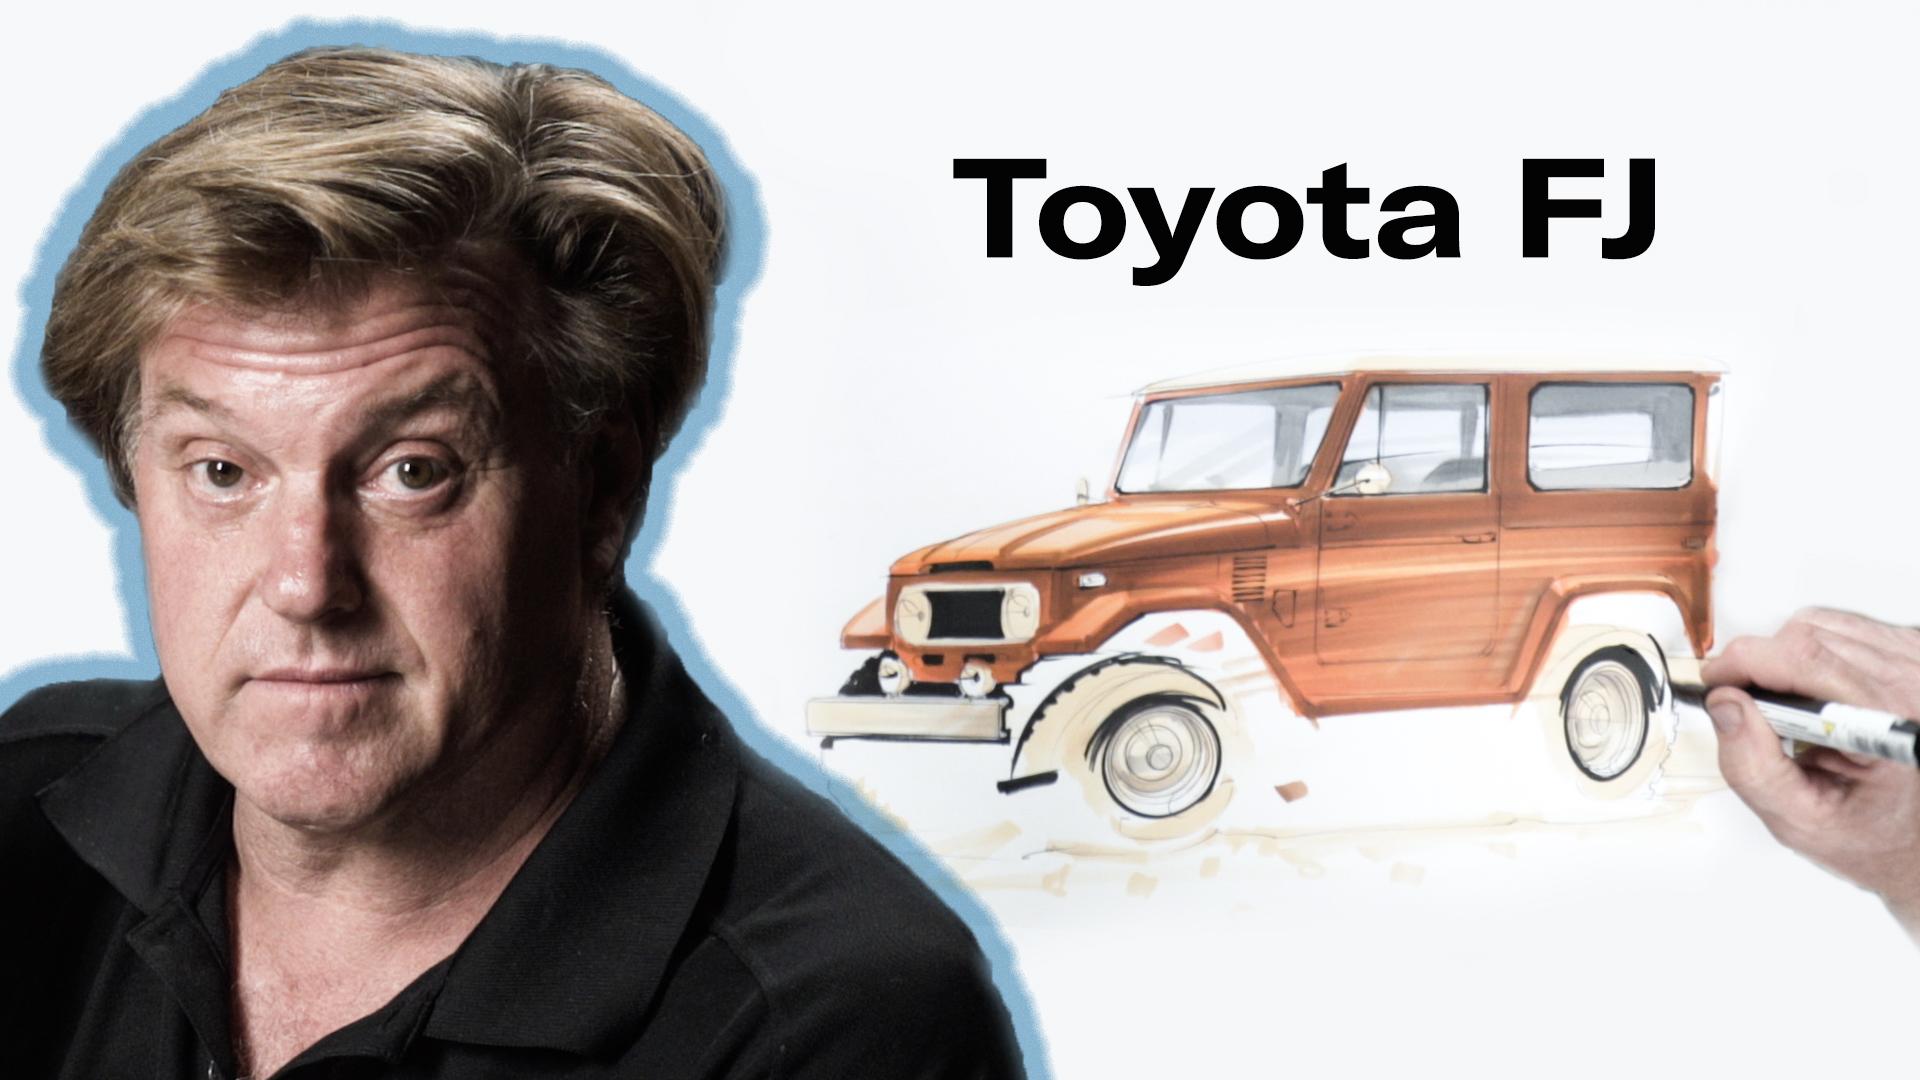 Chip Foose draws a Toyota FJ